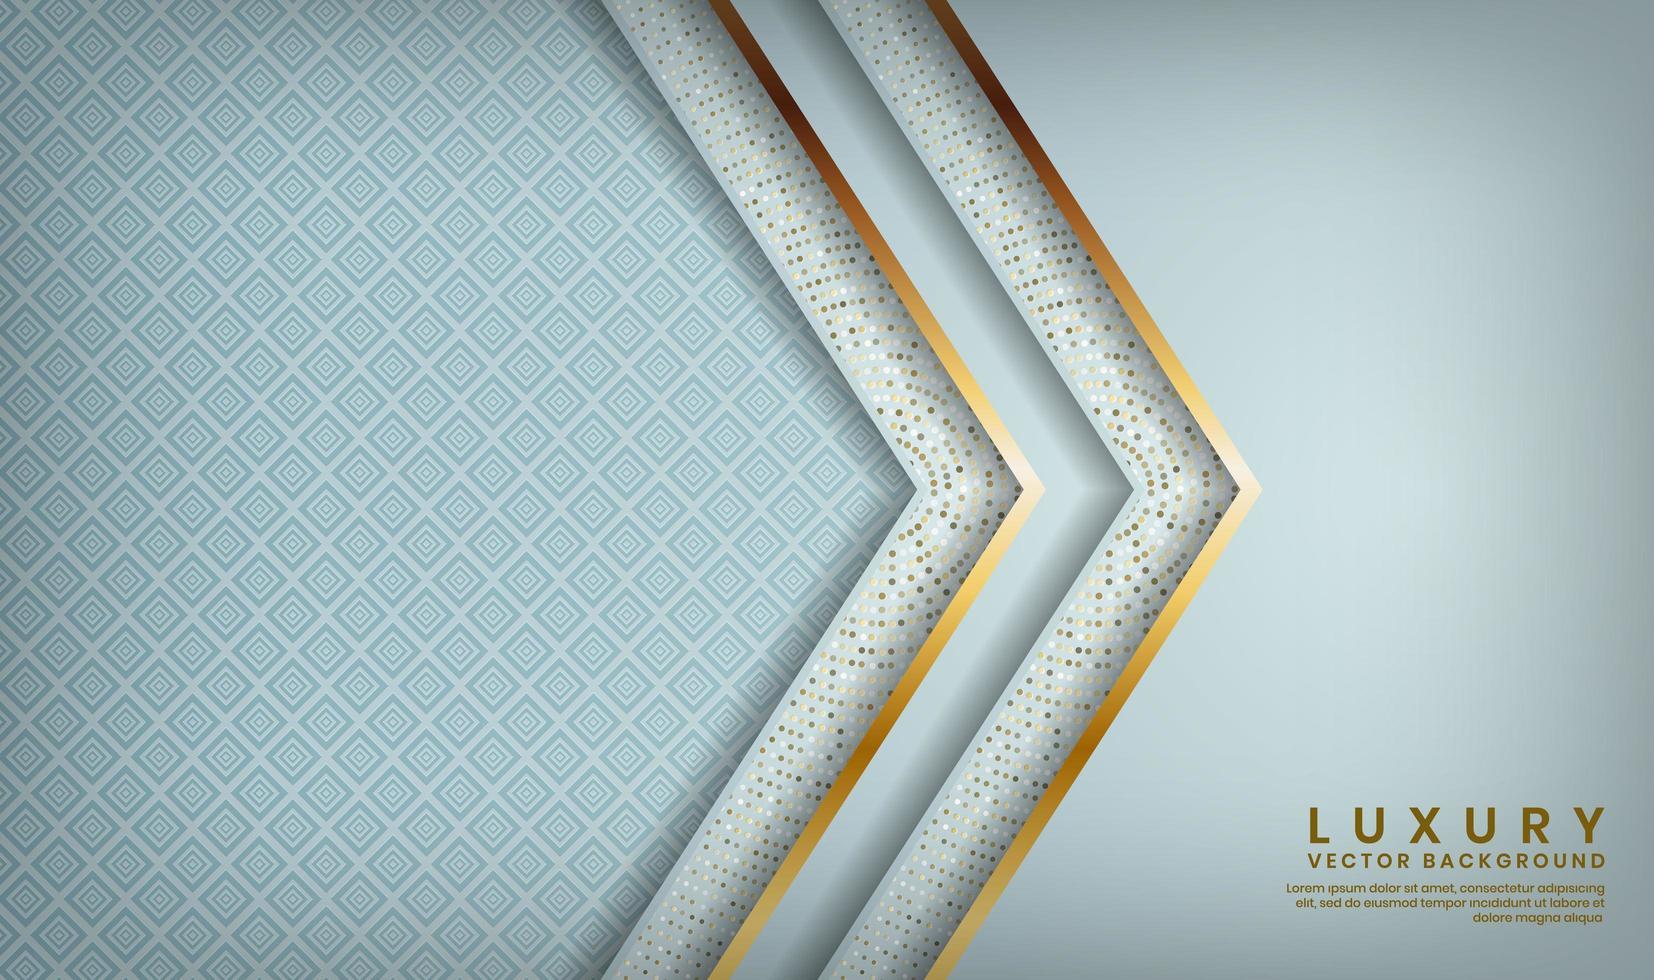 blaues Muster mit pfeilförmigen goldgefütterten Schichten vektor